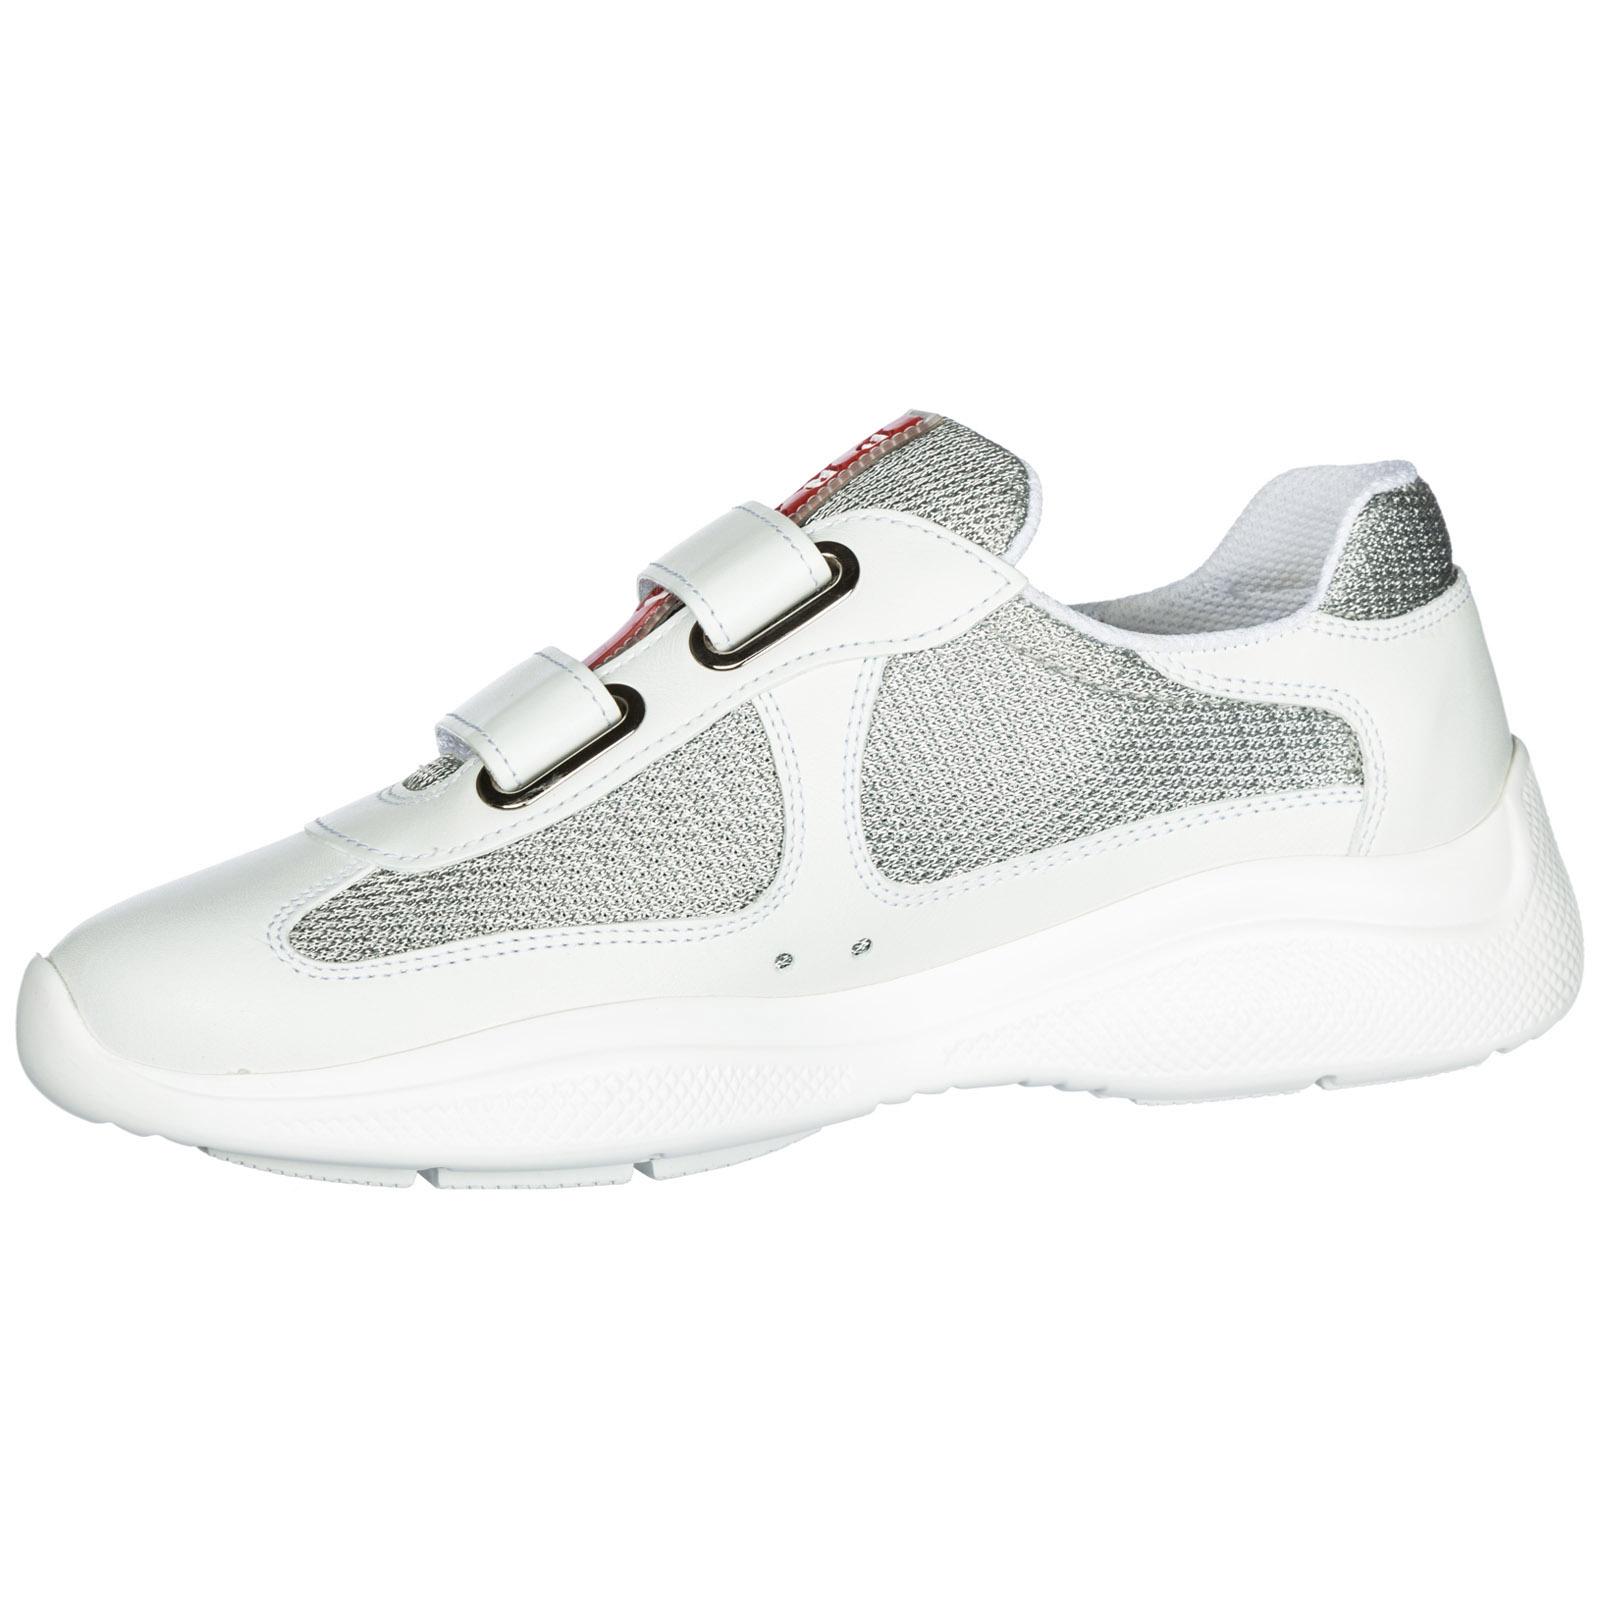 5758eccbfc1 Sneakers Prada America s Cup 1E796I 6GW F0J36 F 025 bianco+argento ...